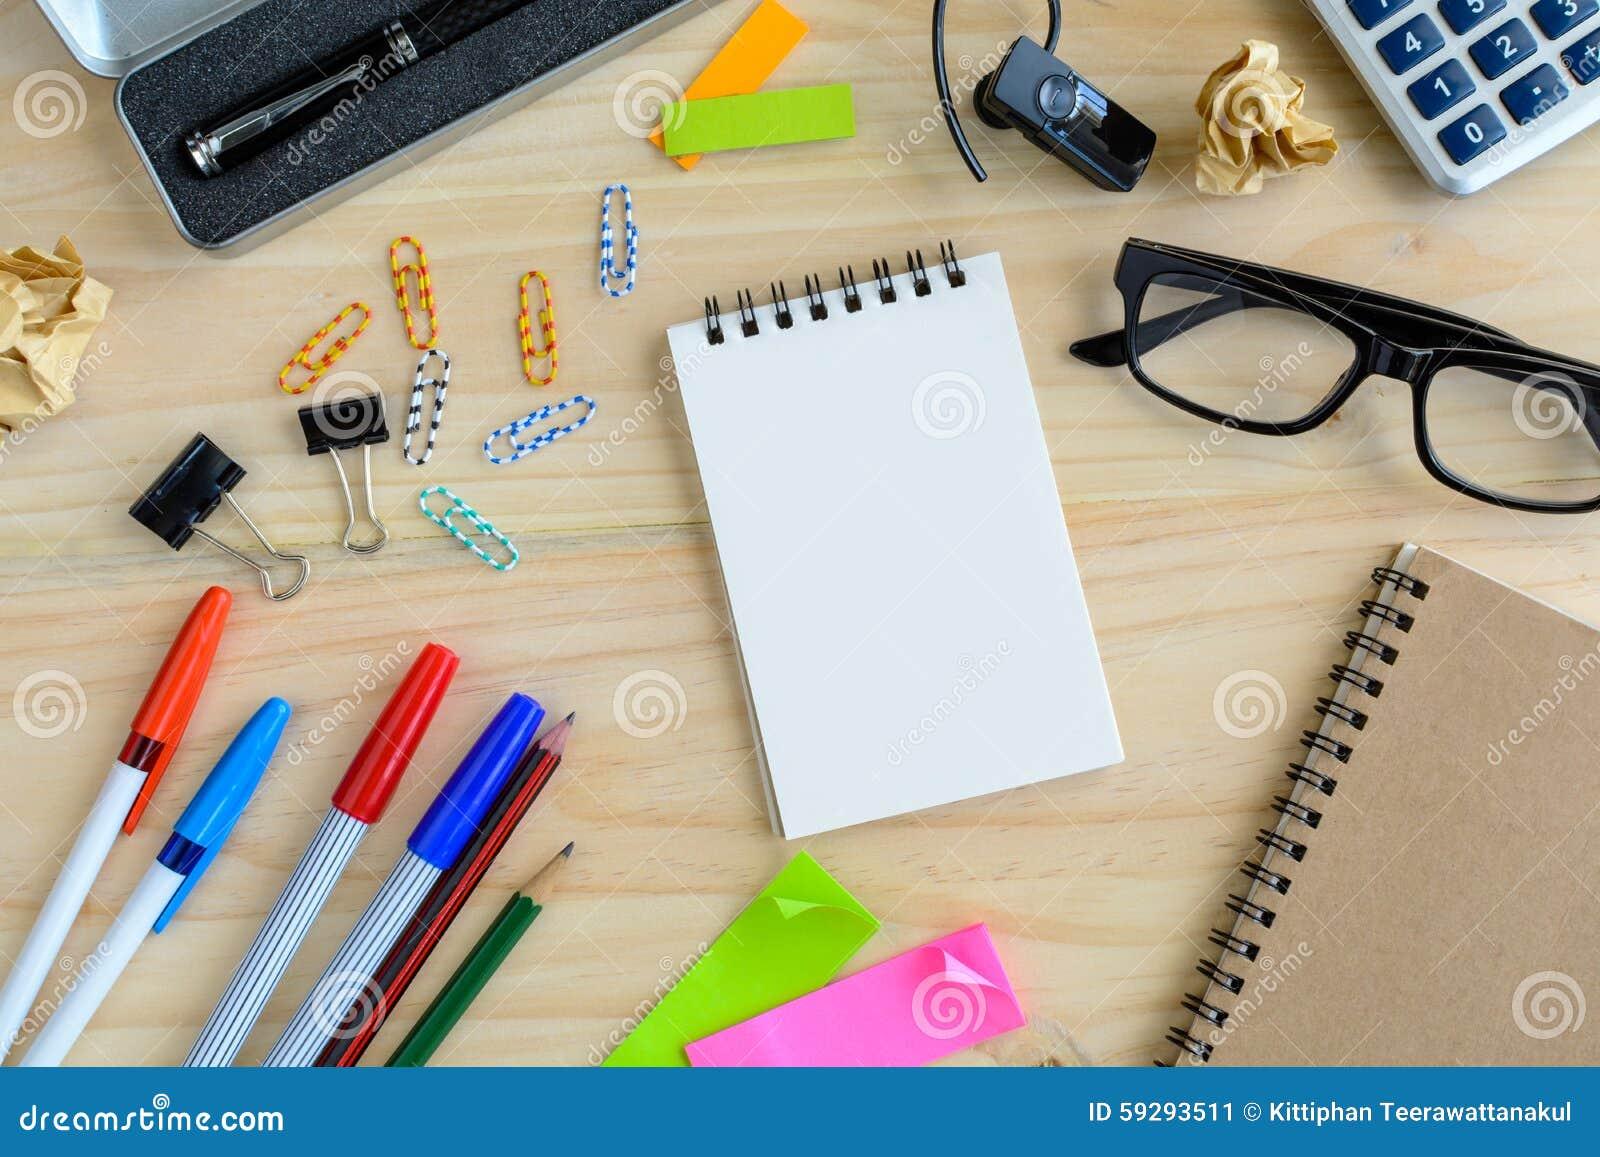 carnet vide avec la fourniture de bureau sur le bureau image stock image 59293511. Black Bedroom Furniture Sets. Home Design Ideas